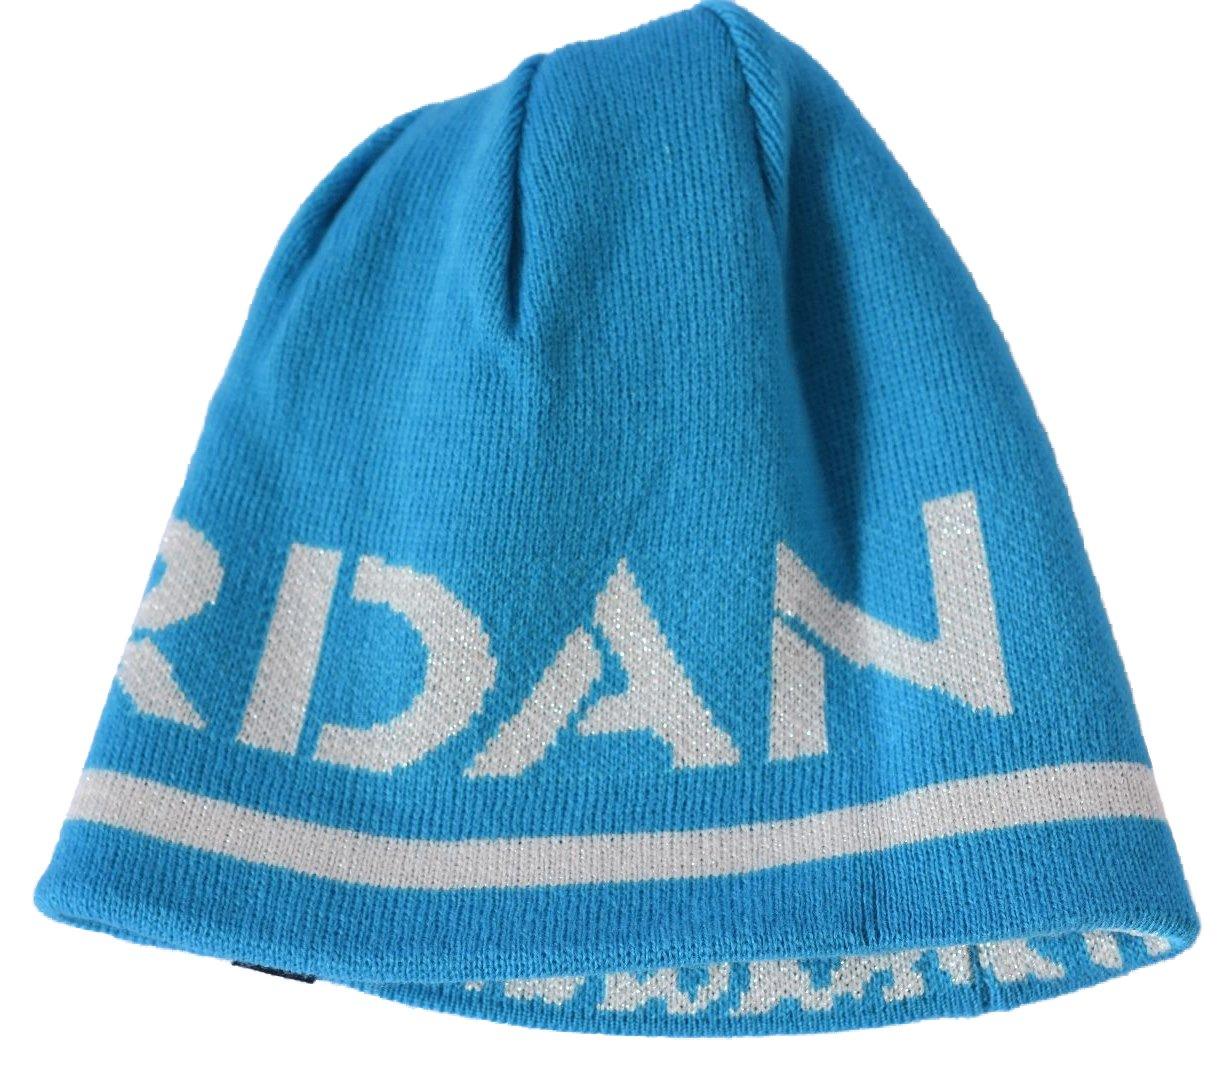 Amazon.com  Jordan Reflections Blue Lagoon Reversible Boys Beanie Hat Size   8 20  Sports   Outdoors 651474356c53